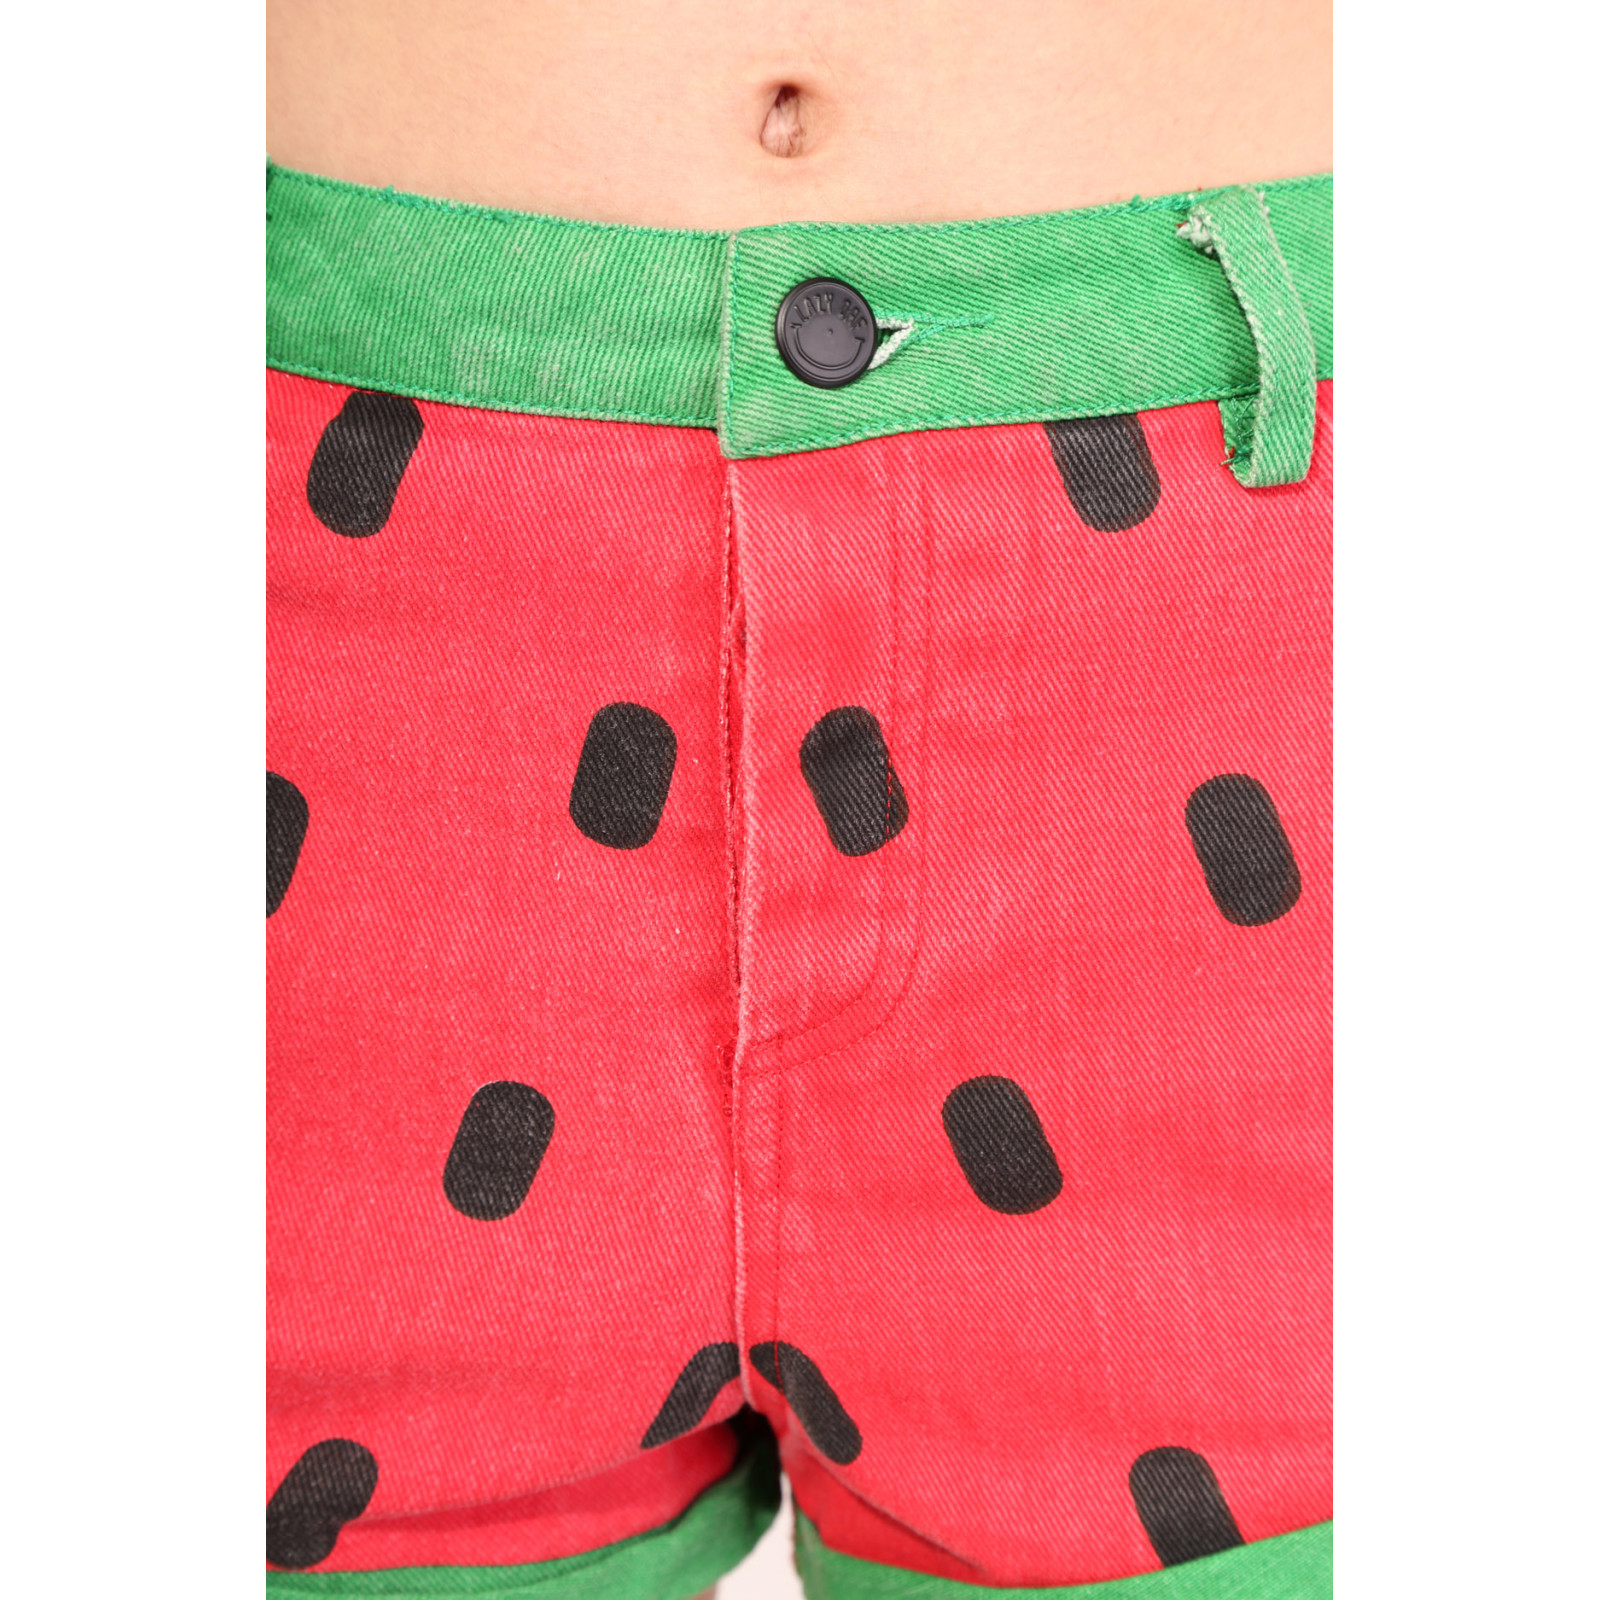 Lazy oaf strawberry short cake shorts